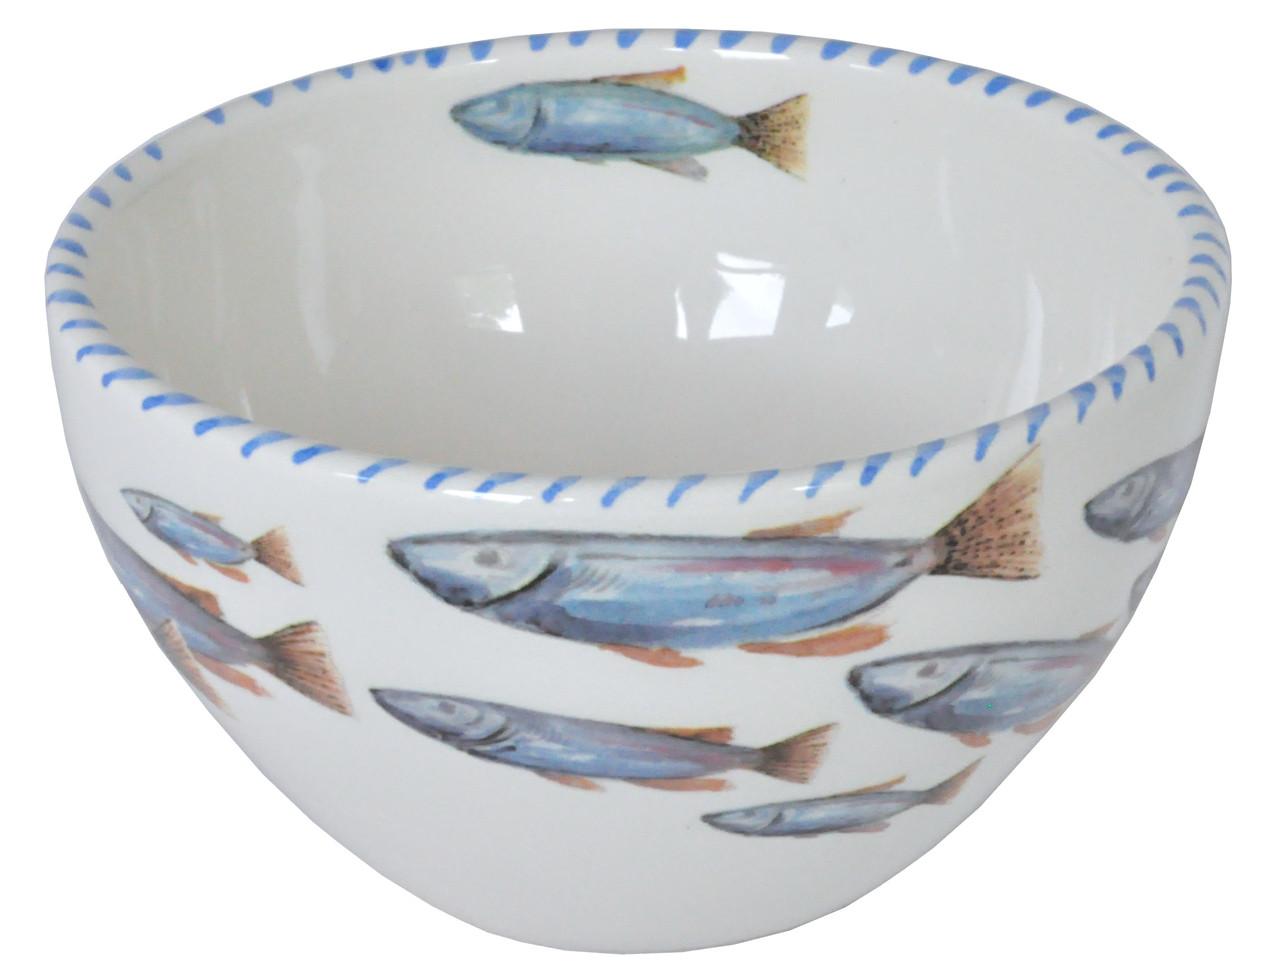 Blue School of Fish Soup Bowls  Set of 6